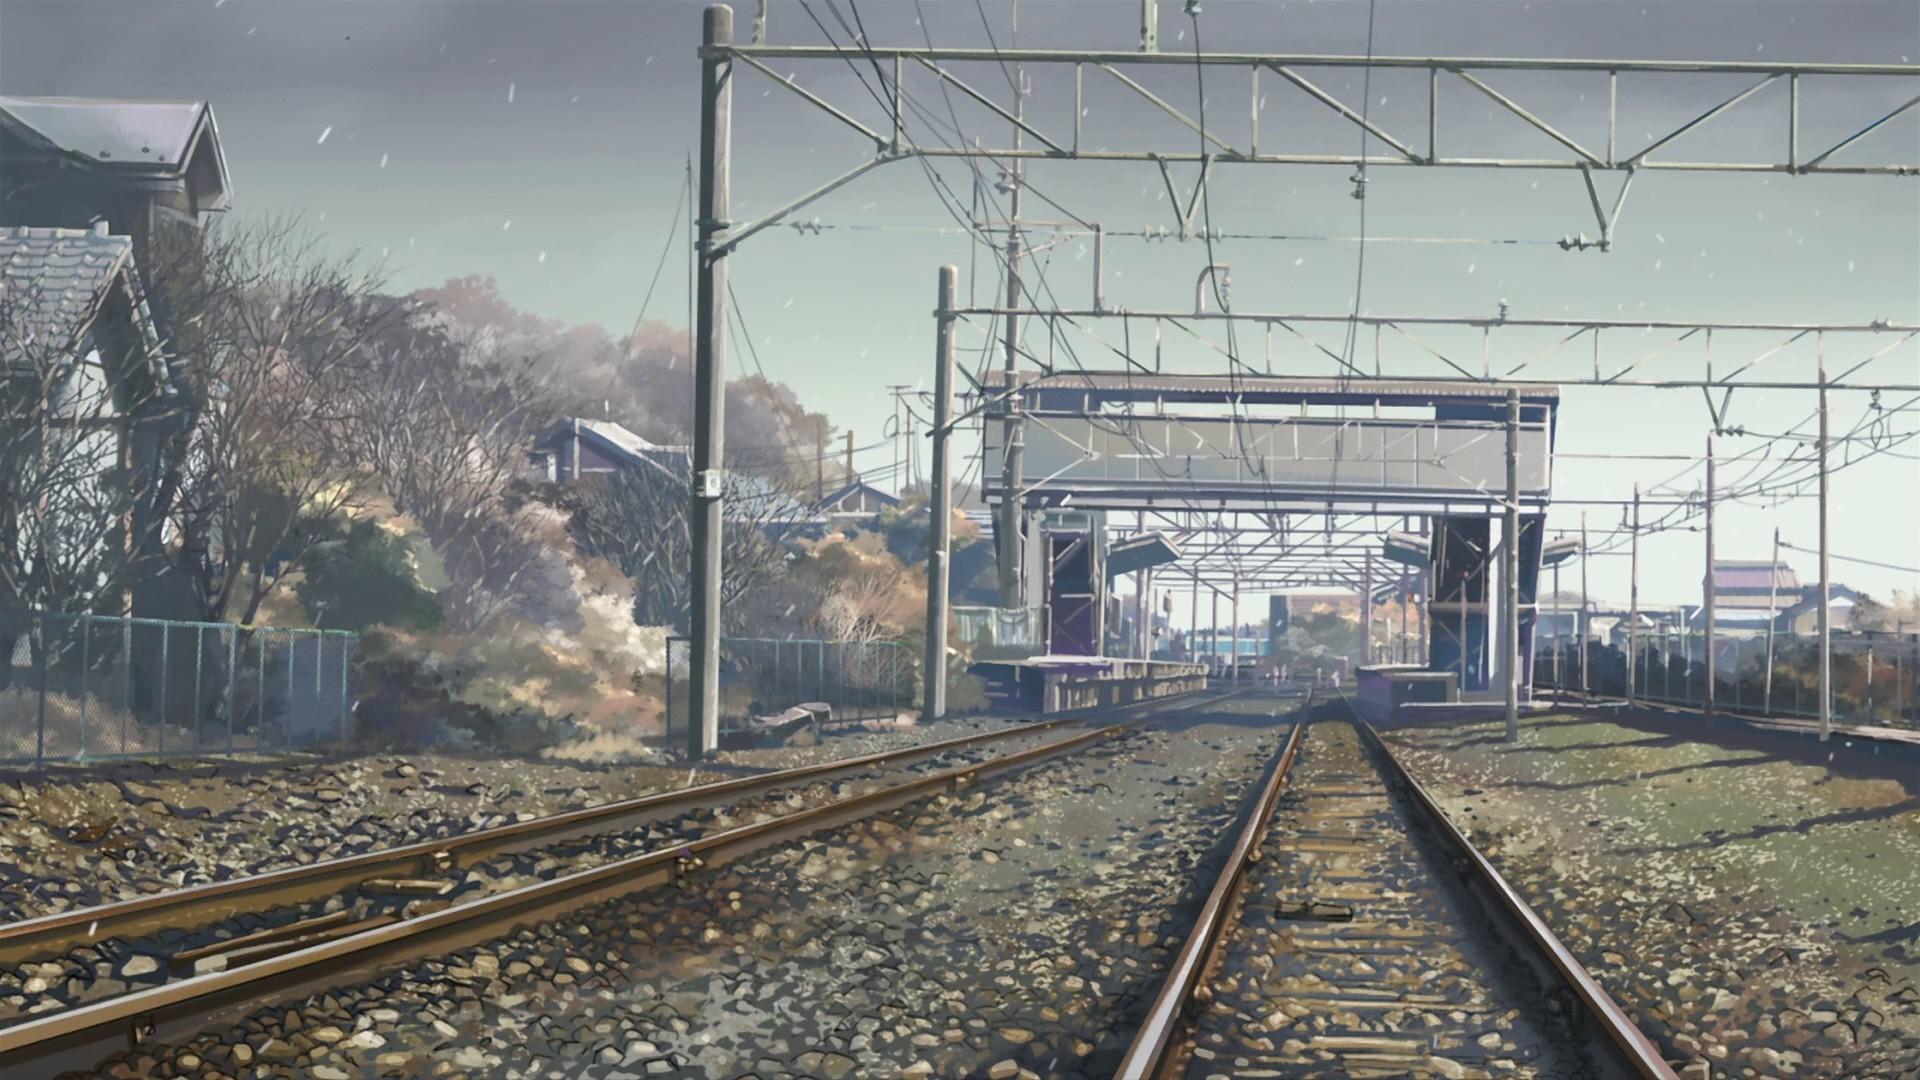 Anime Vehicle Train Train Station 5 Centimeters Per Second Makoto Shinkai Transport Locomotive Electricity Track Public